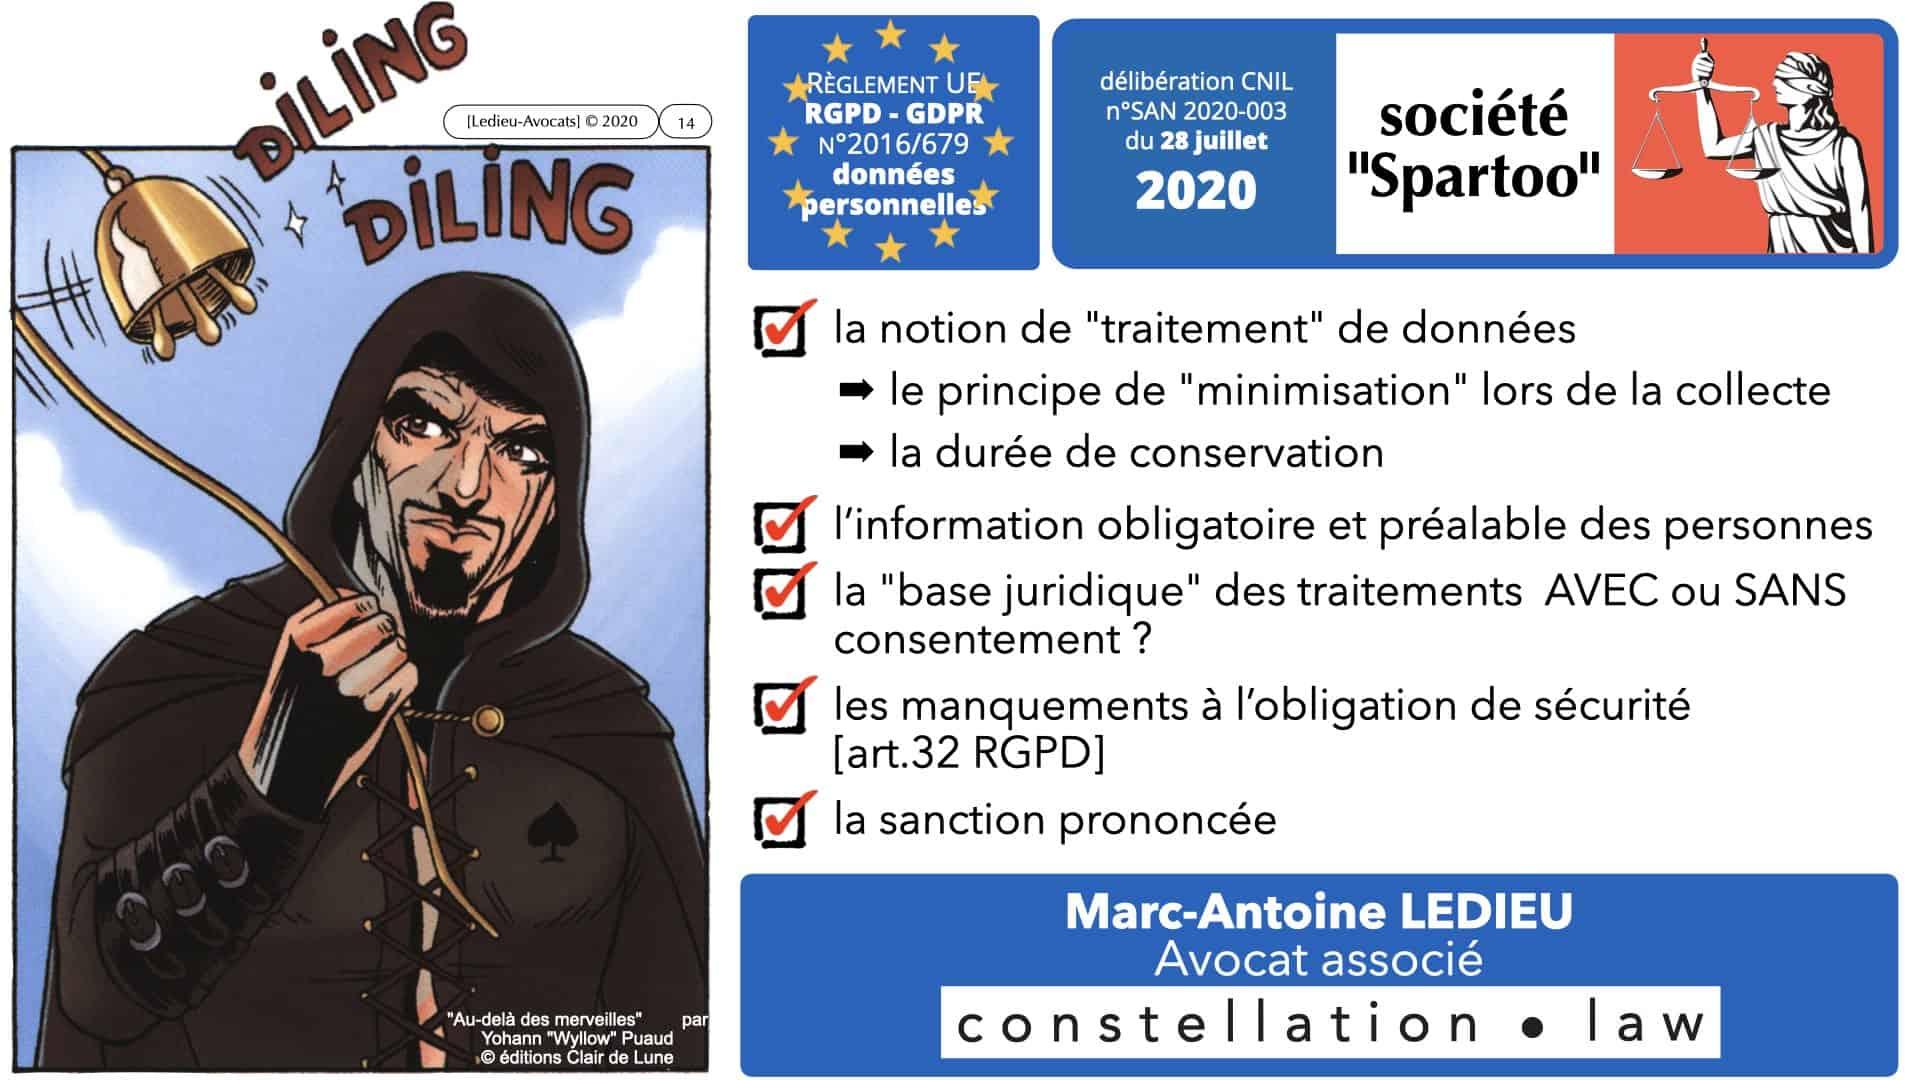 RGPD délibération CNIL Spartoo du 28 juillet 2020 n°SAN 2020-003